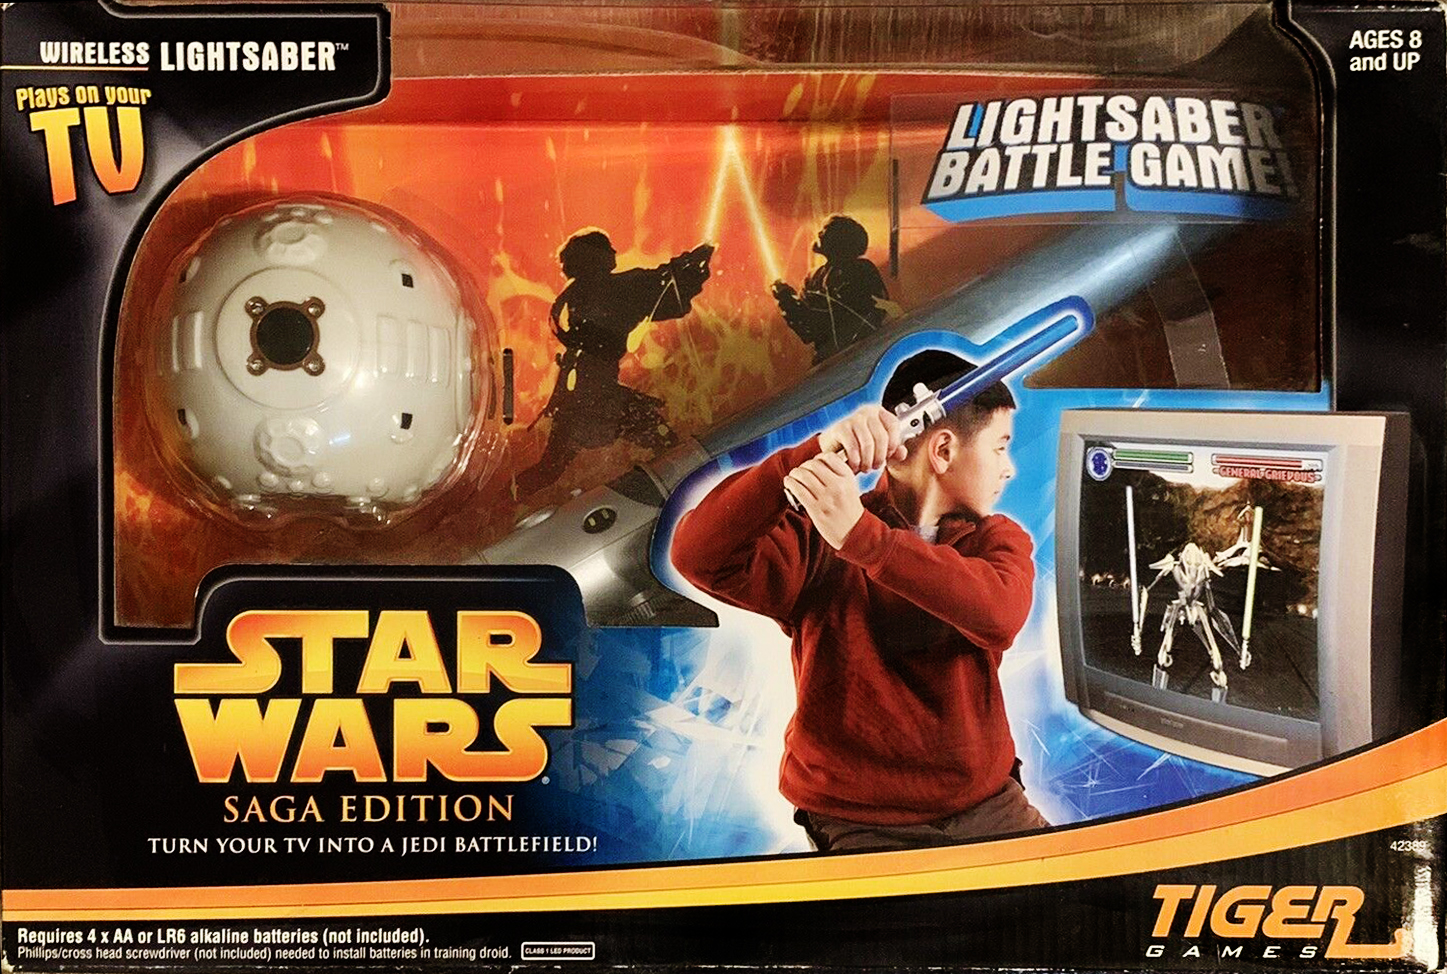 Star Wars: Saga Edition: Lightsaber Battle Game